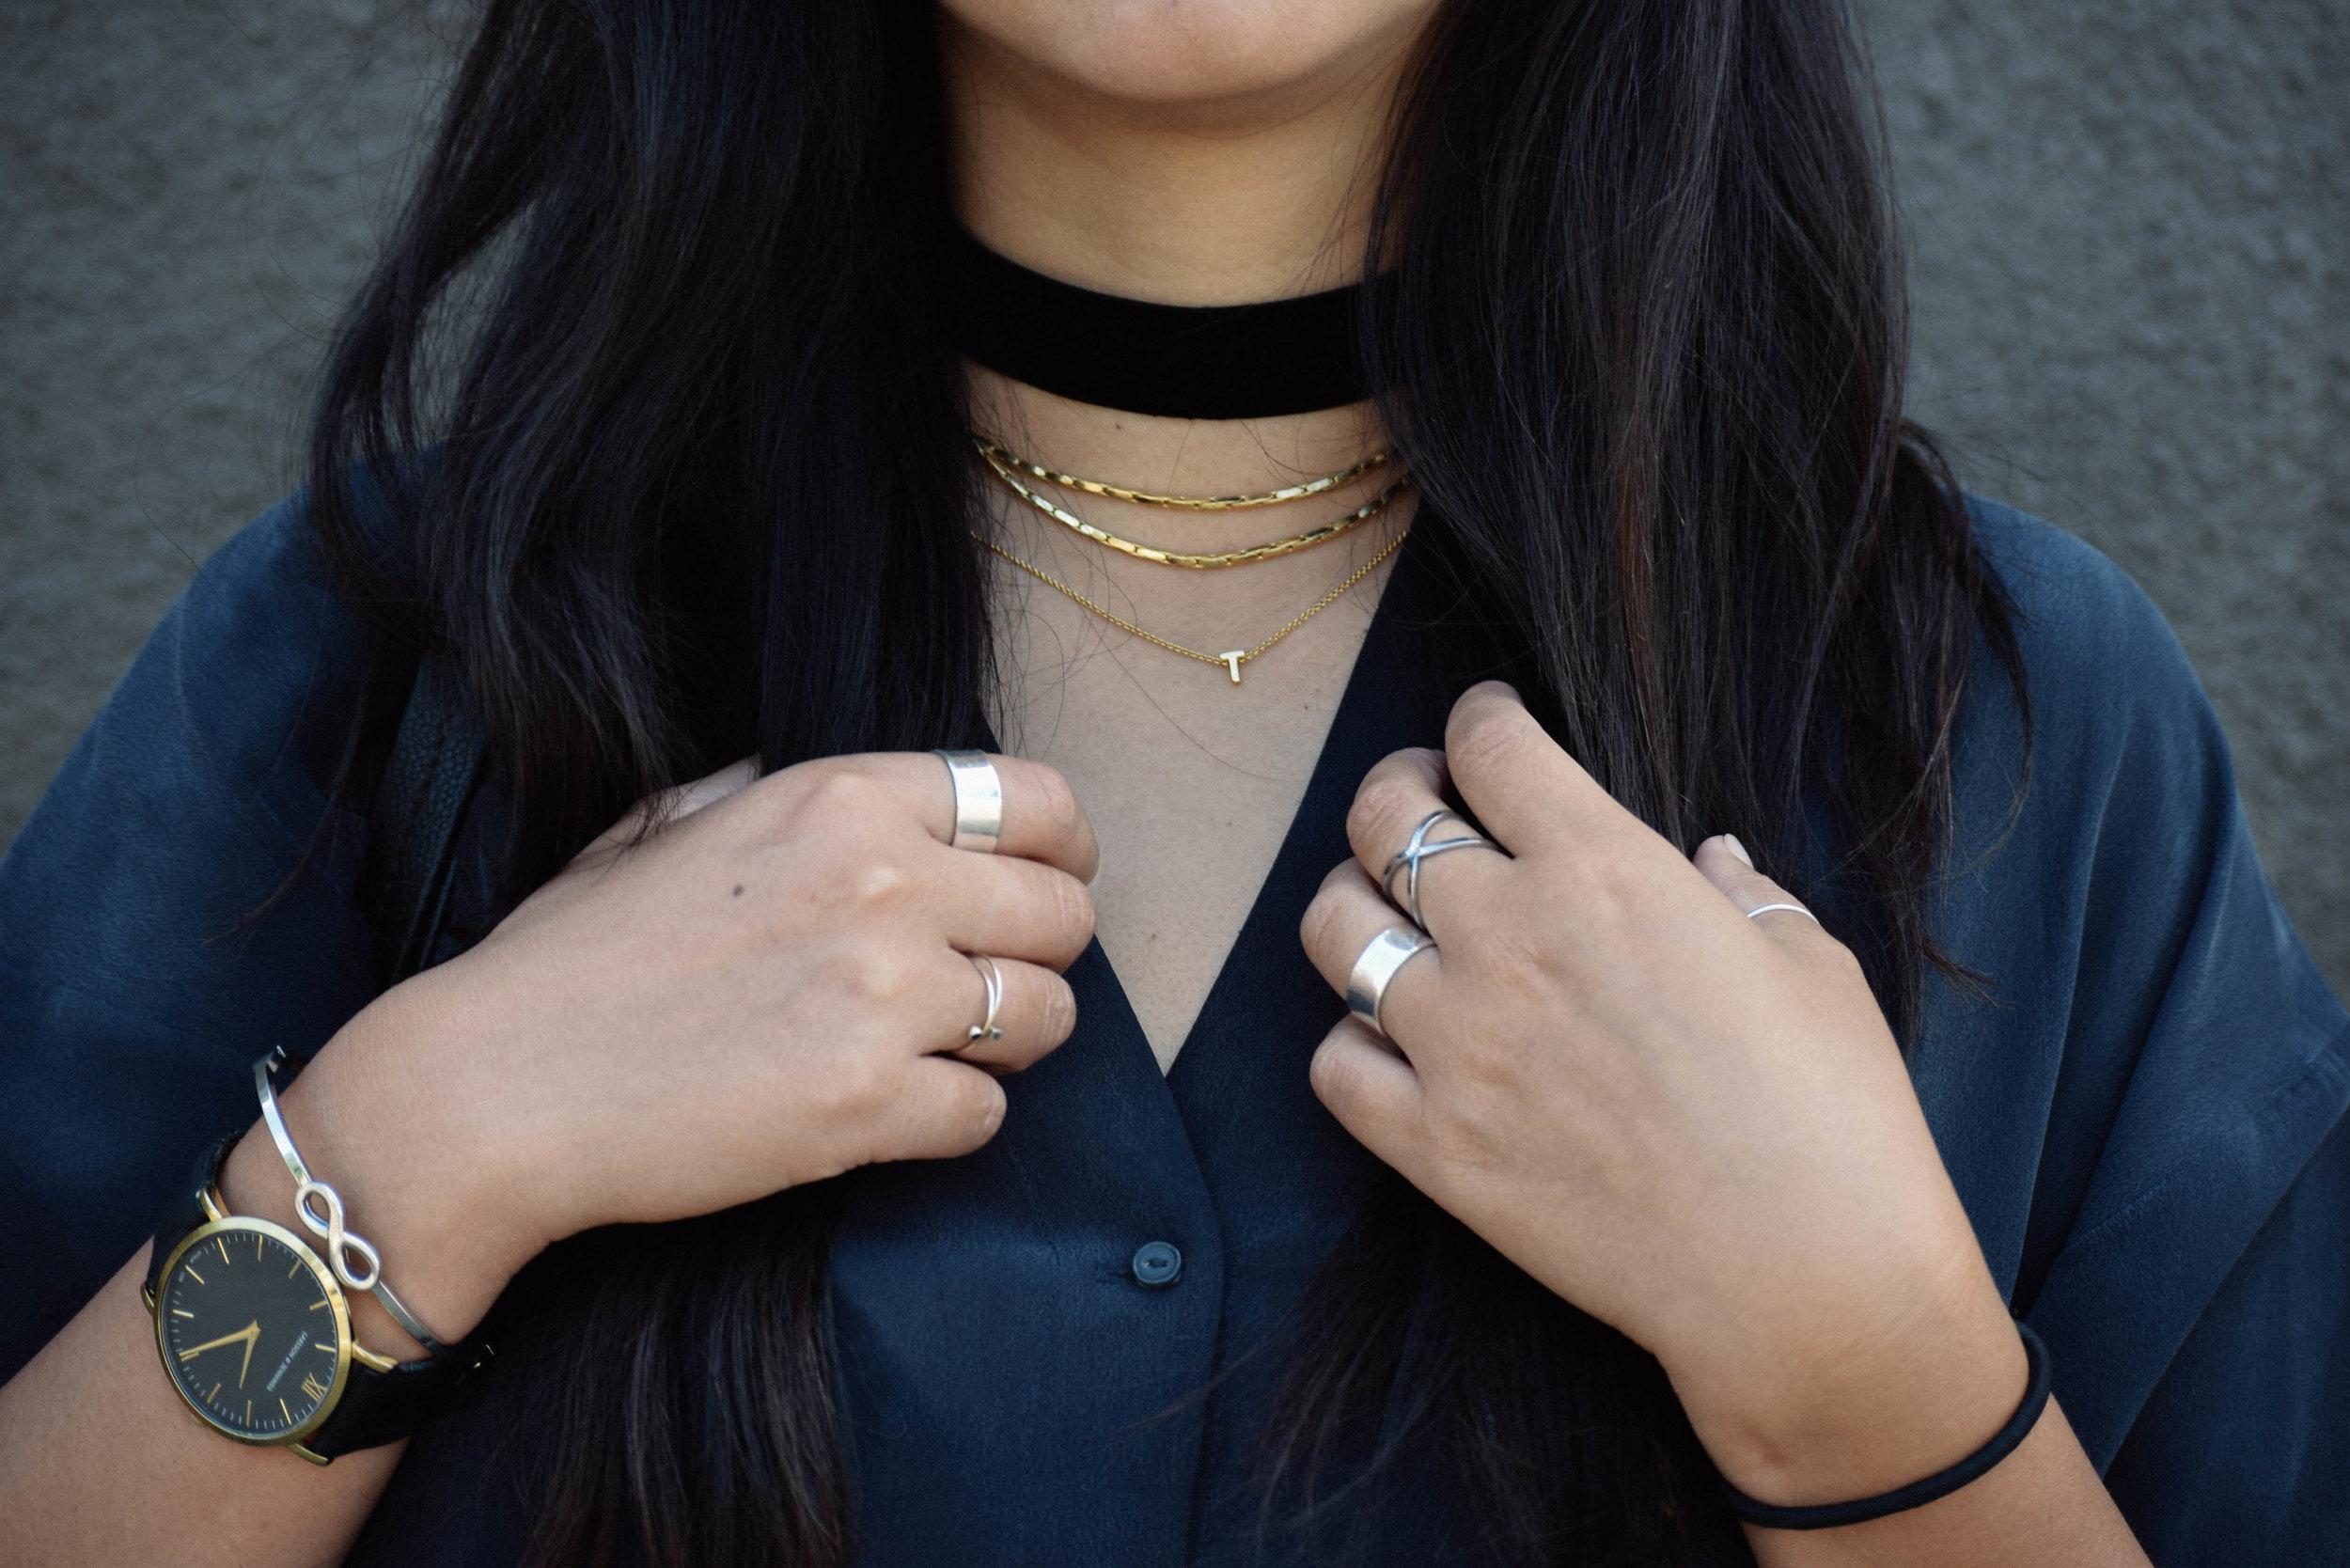 VANESSA MOONEY   choker   / LACEY RYAN   double snake choker necklace   / GORJANA  letter necklace (similar  here )